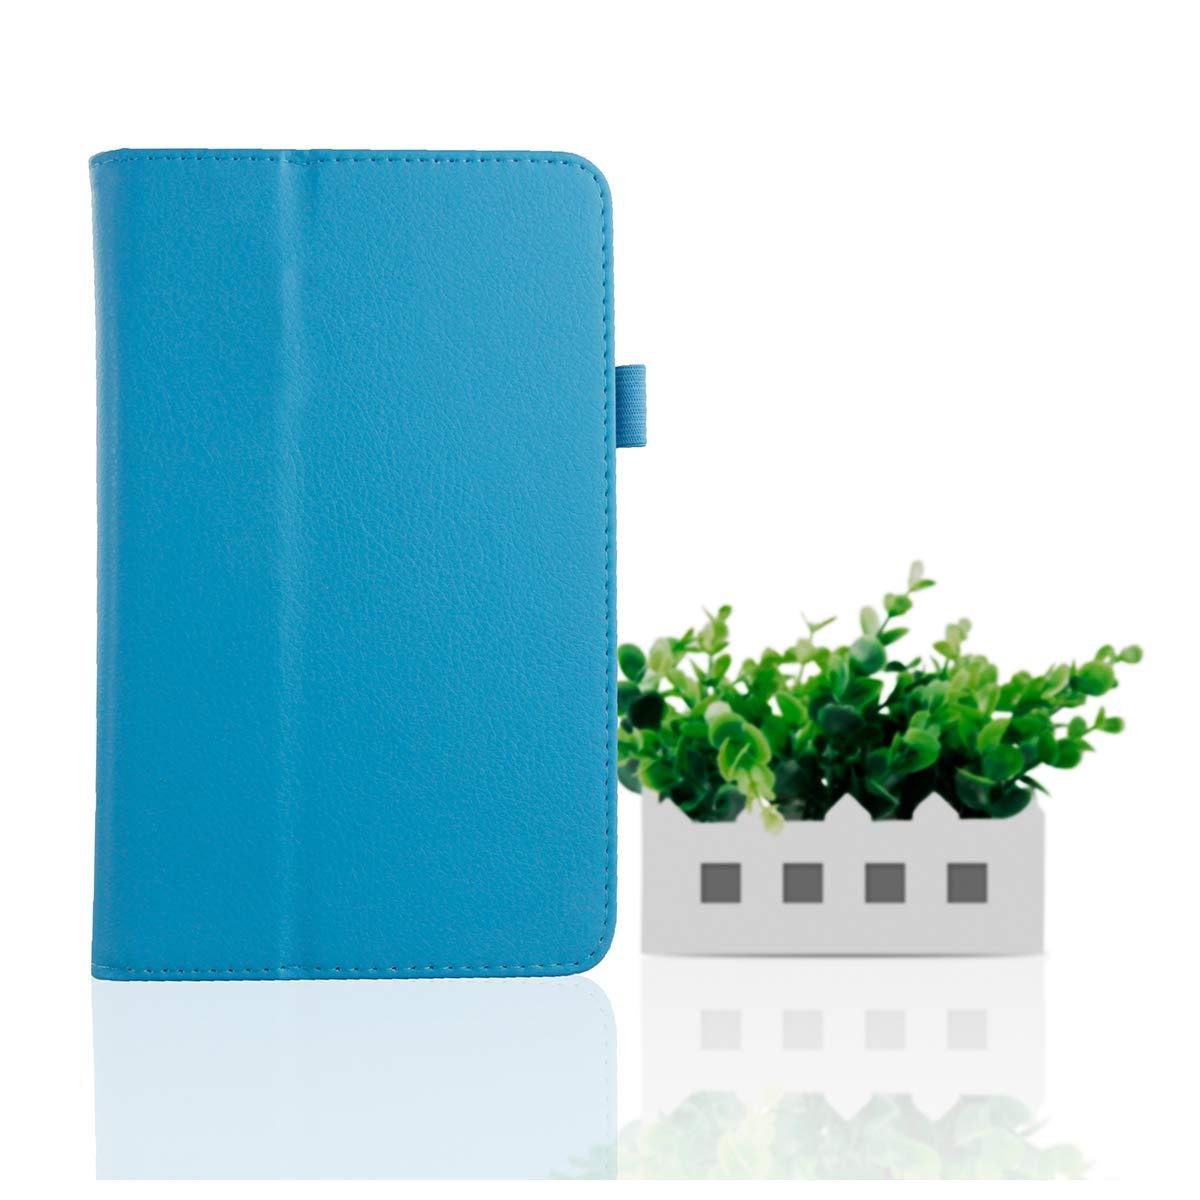 LG G Pad 7.0 V400 プレミアム PUレザー フリップケース ケースリストレザーケース カード付き ブルー C605-Q0-522  ブルー B07LFD2388